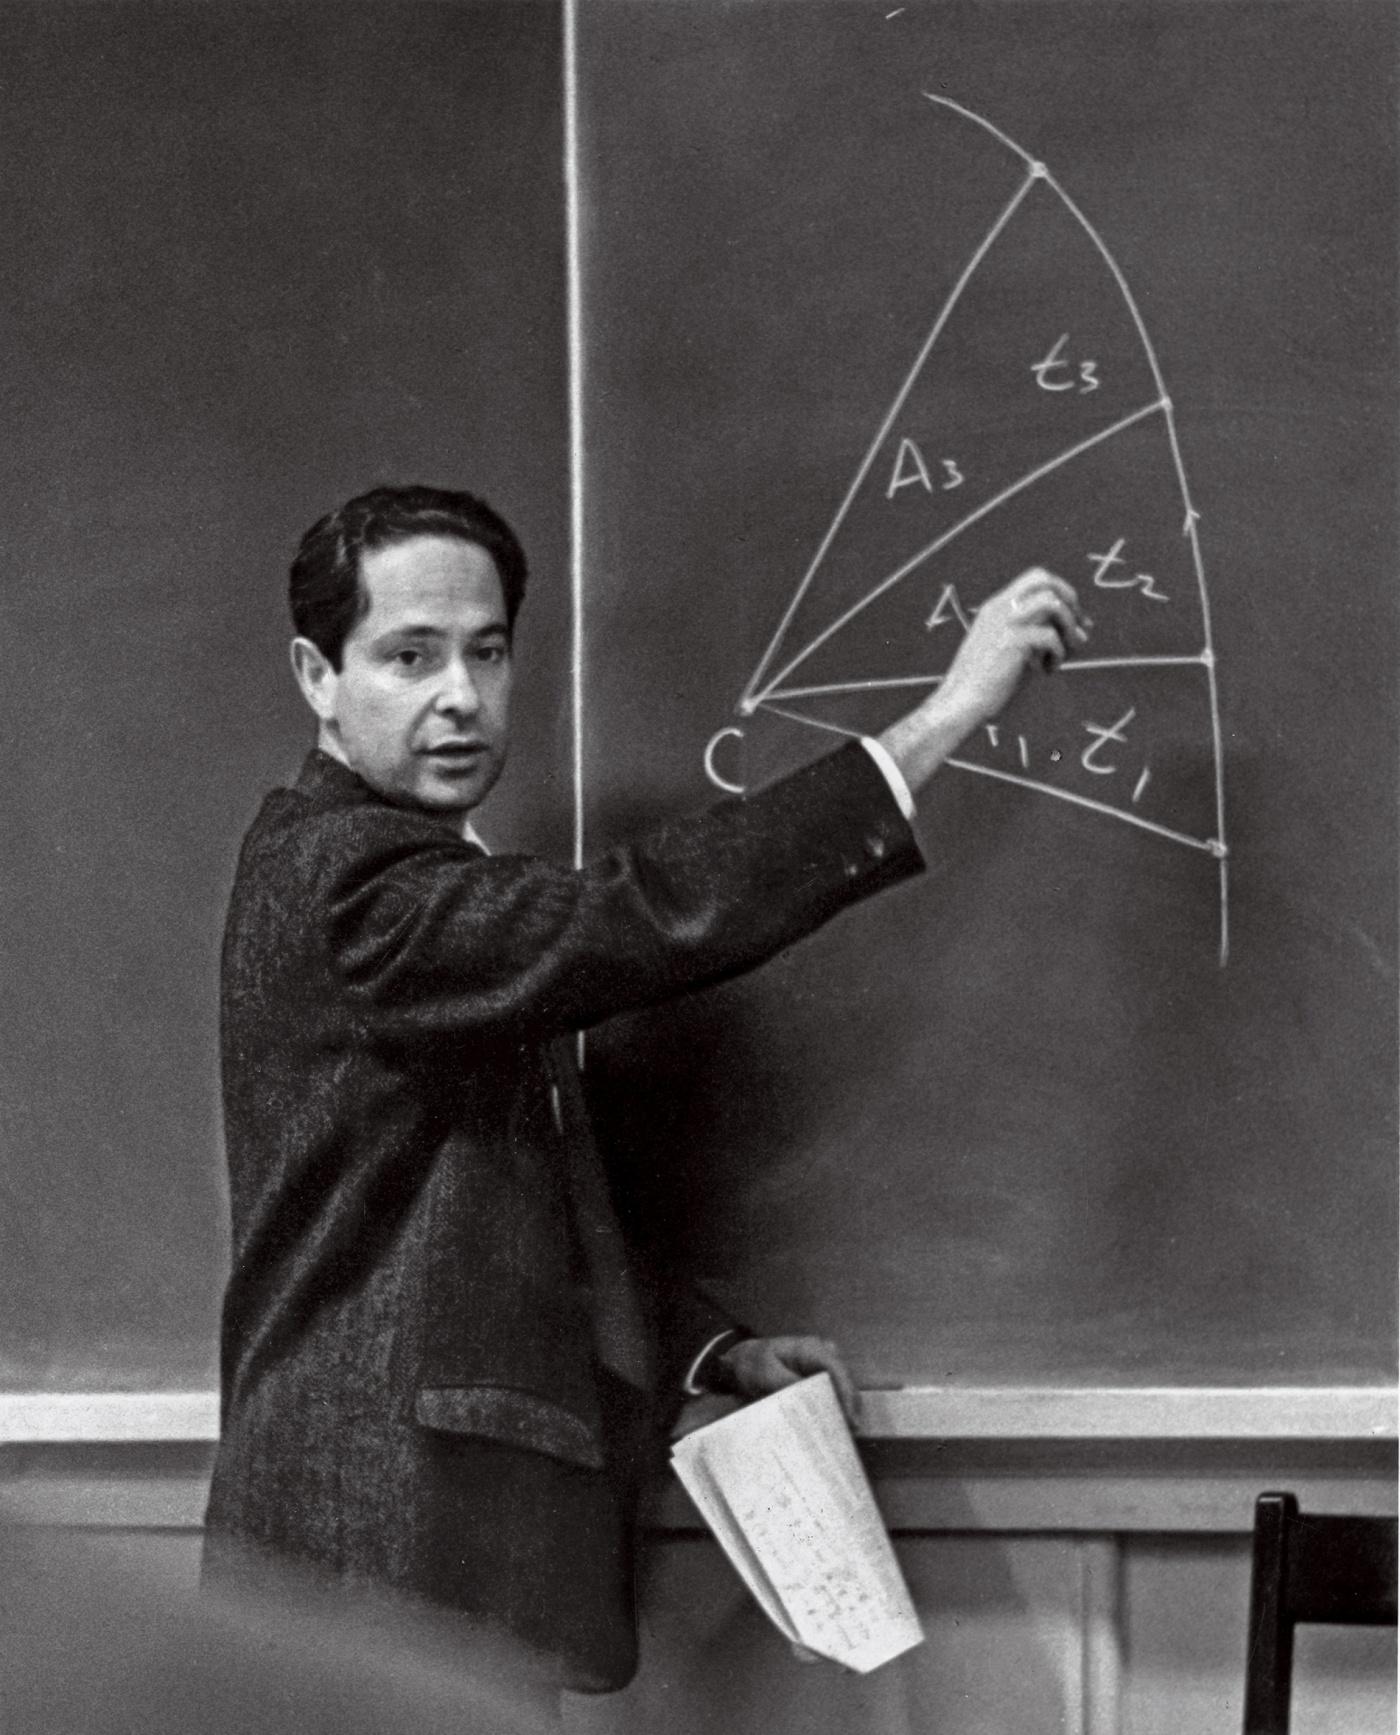 portrait of George Morgan at the blackboard